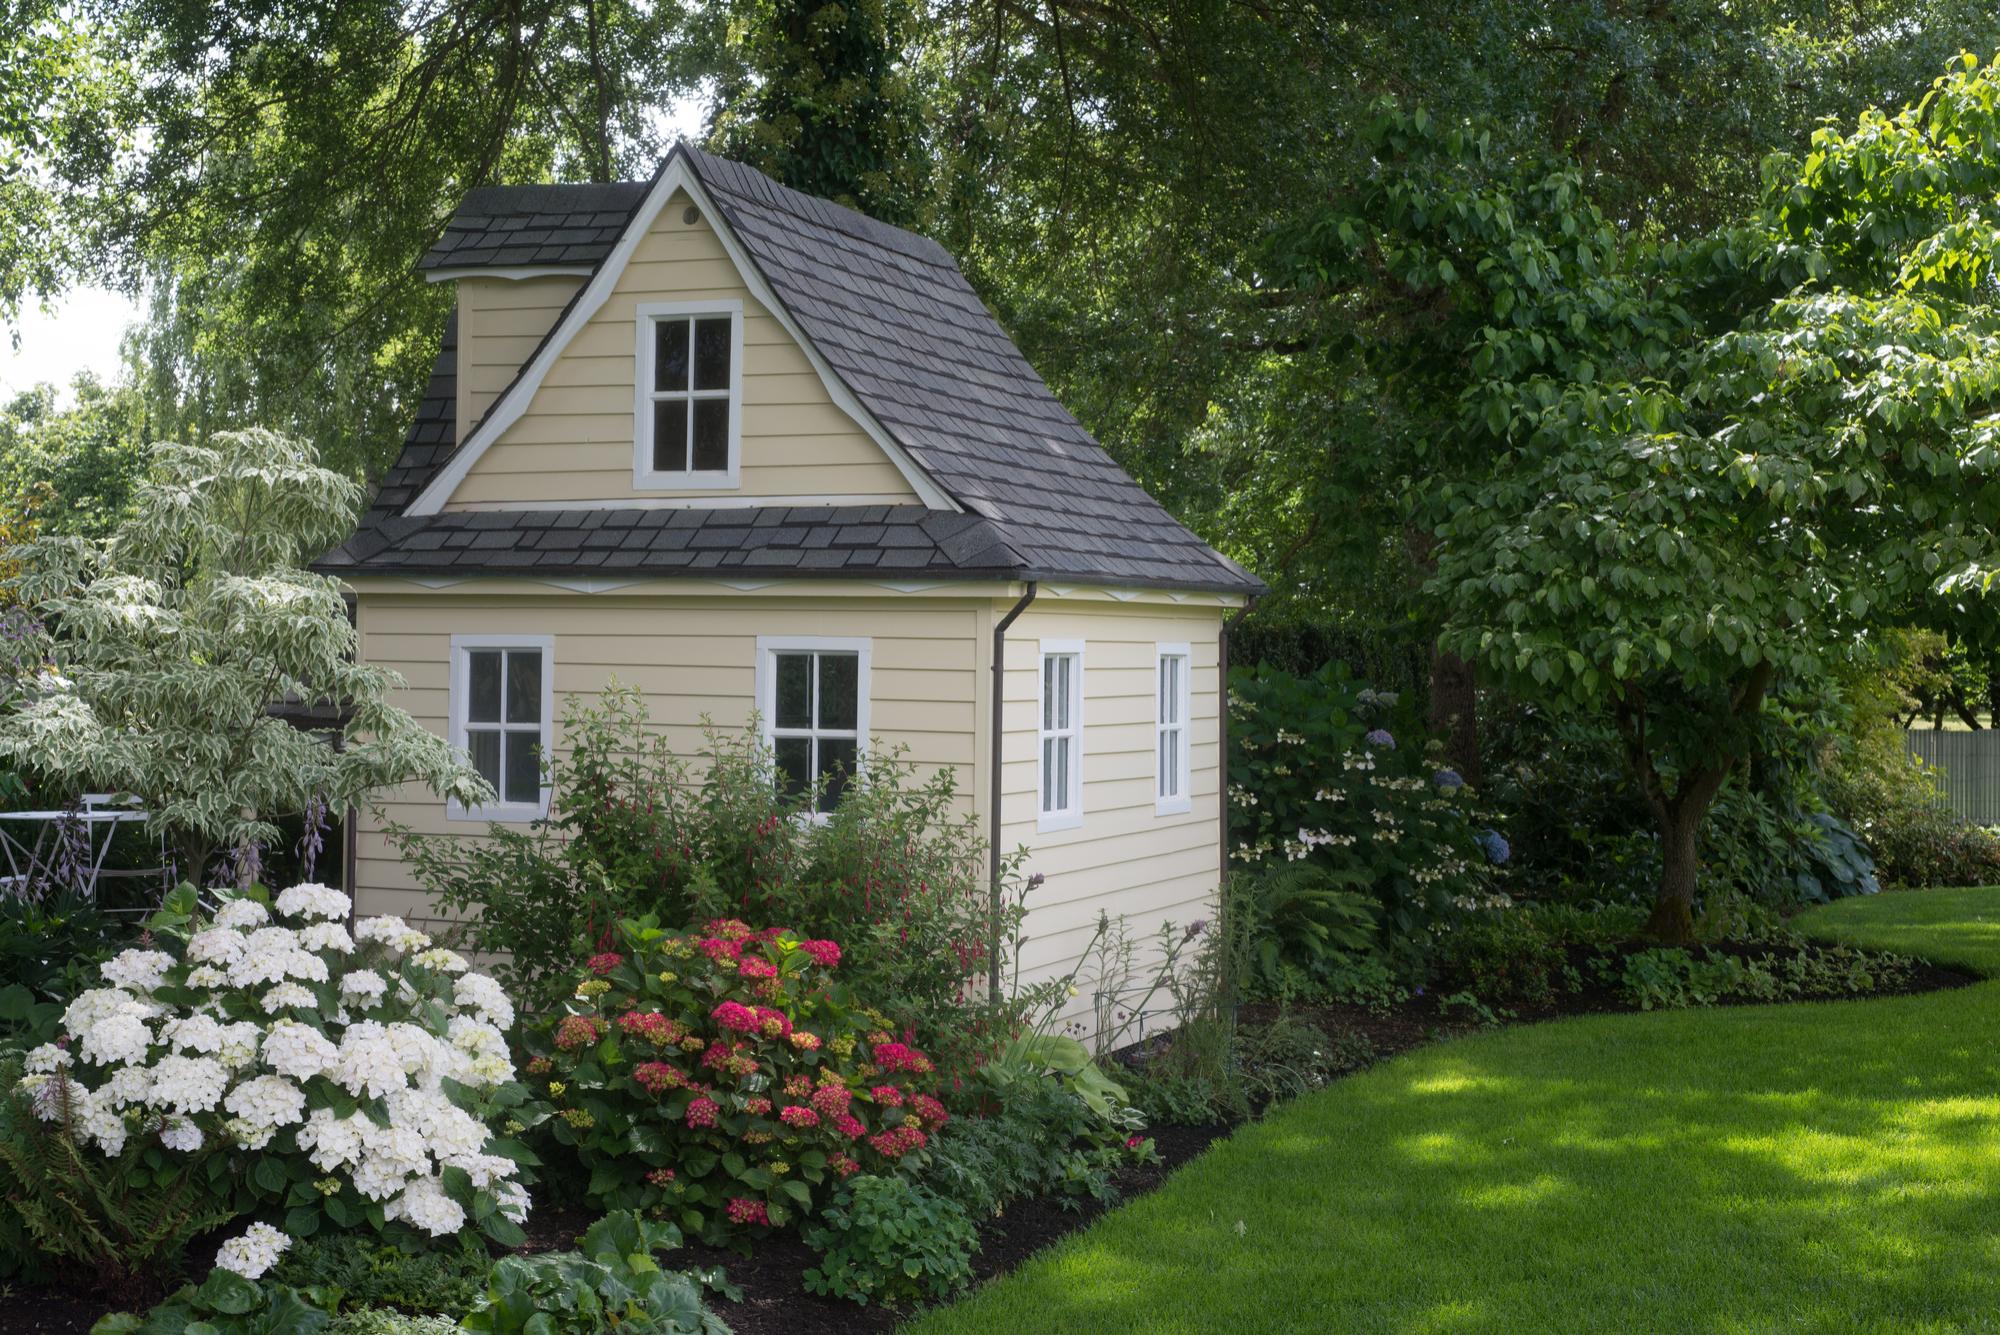 Tiny House Landscaping ideas